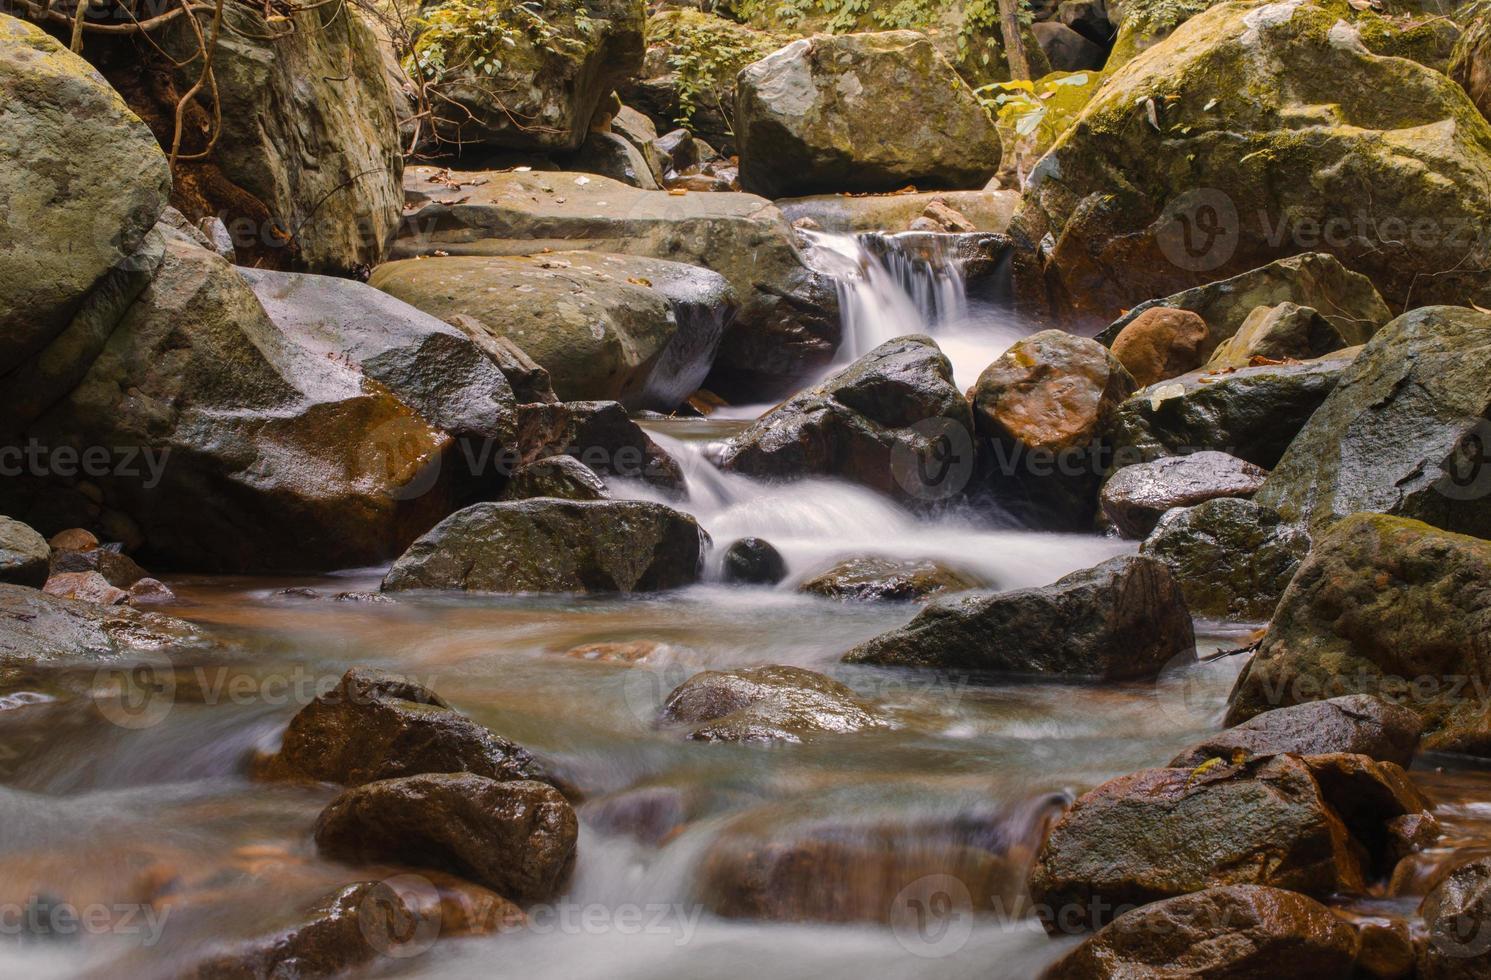 vattenfall i djup regnskogsjungel vid nationalparken, foto